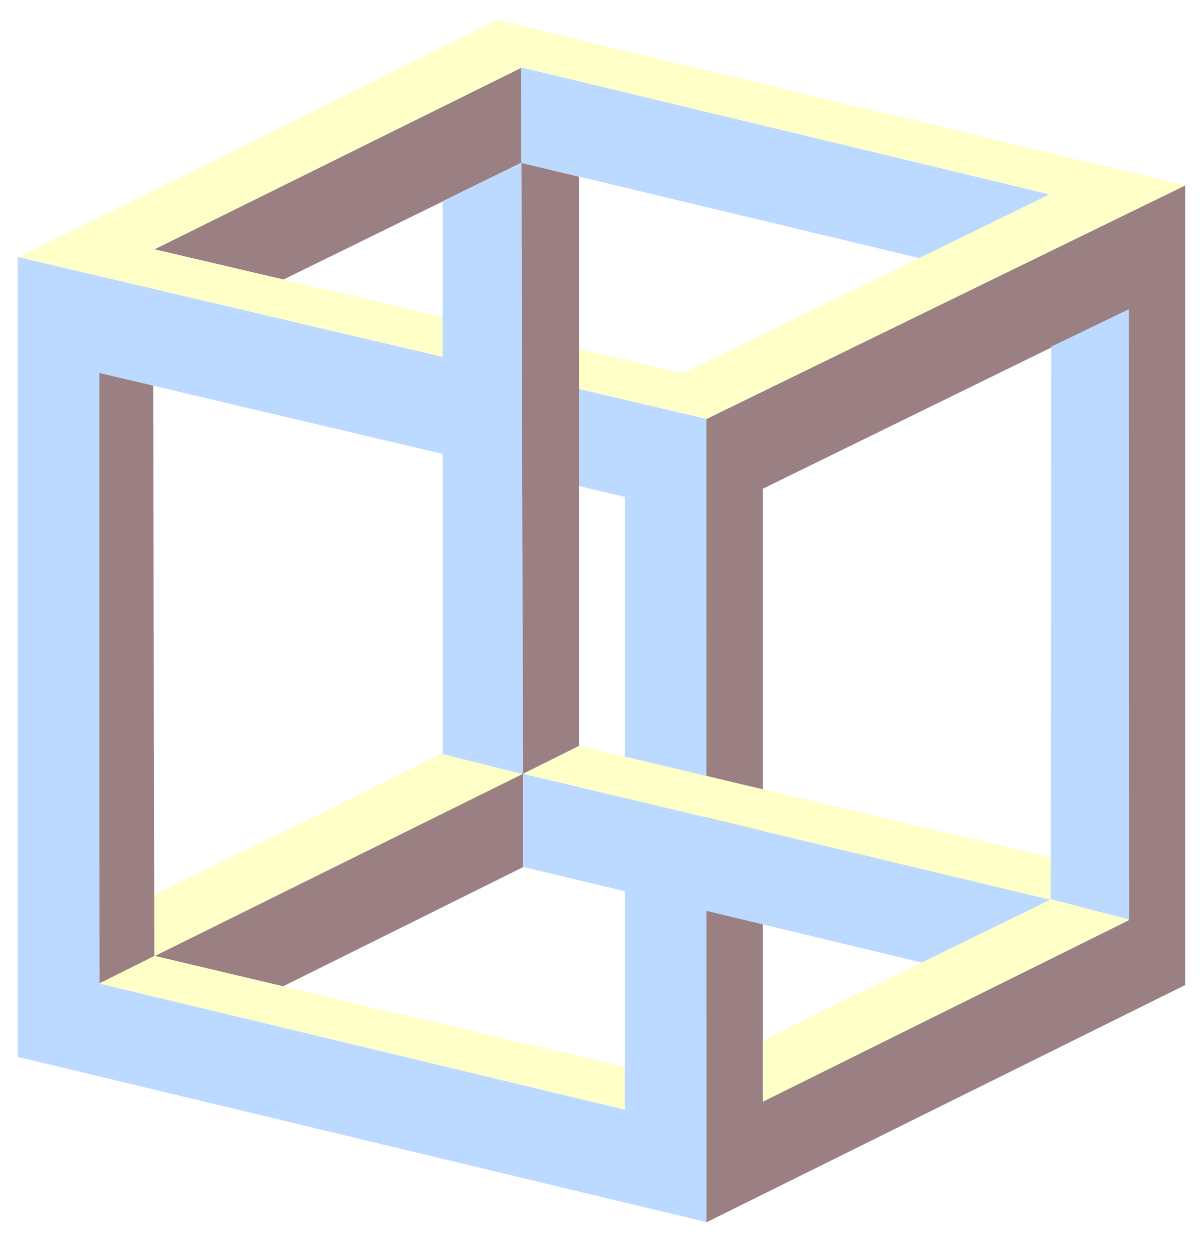 Impossible Cube Wikipedia Optical Illusions Amazing Optical